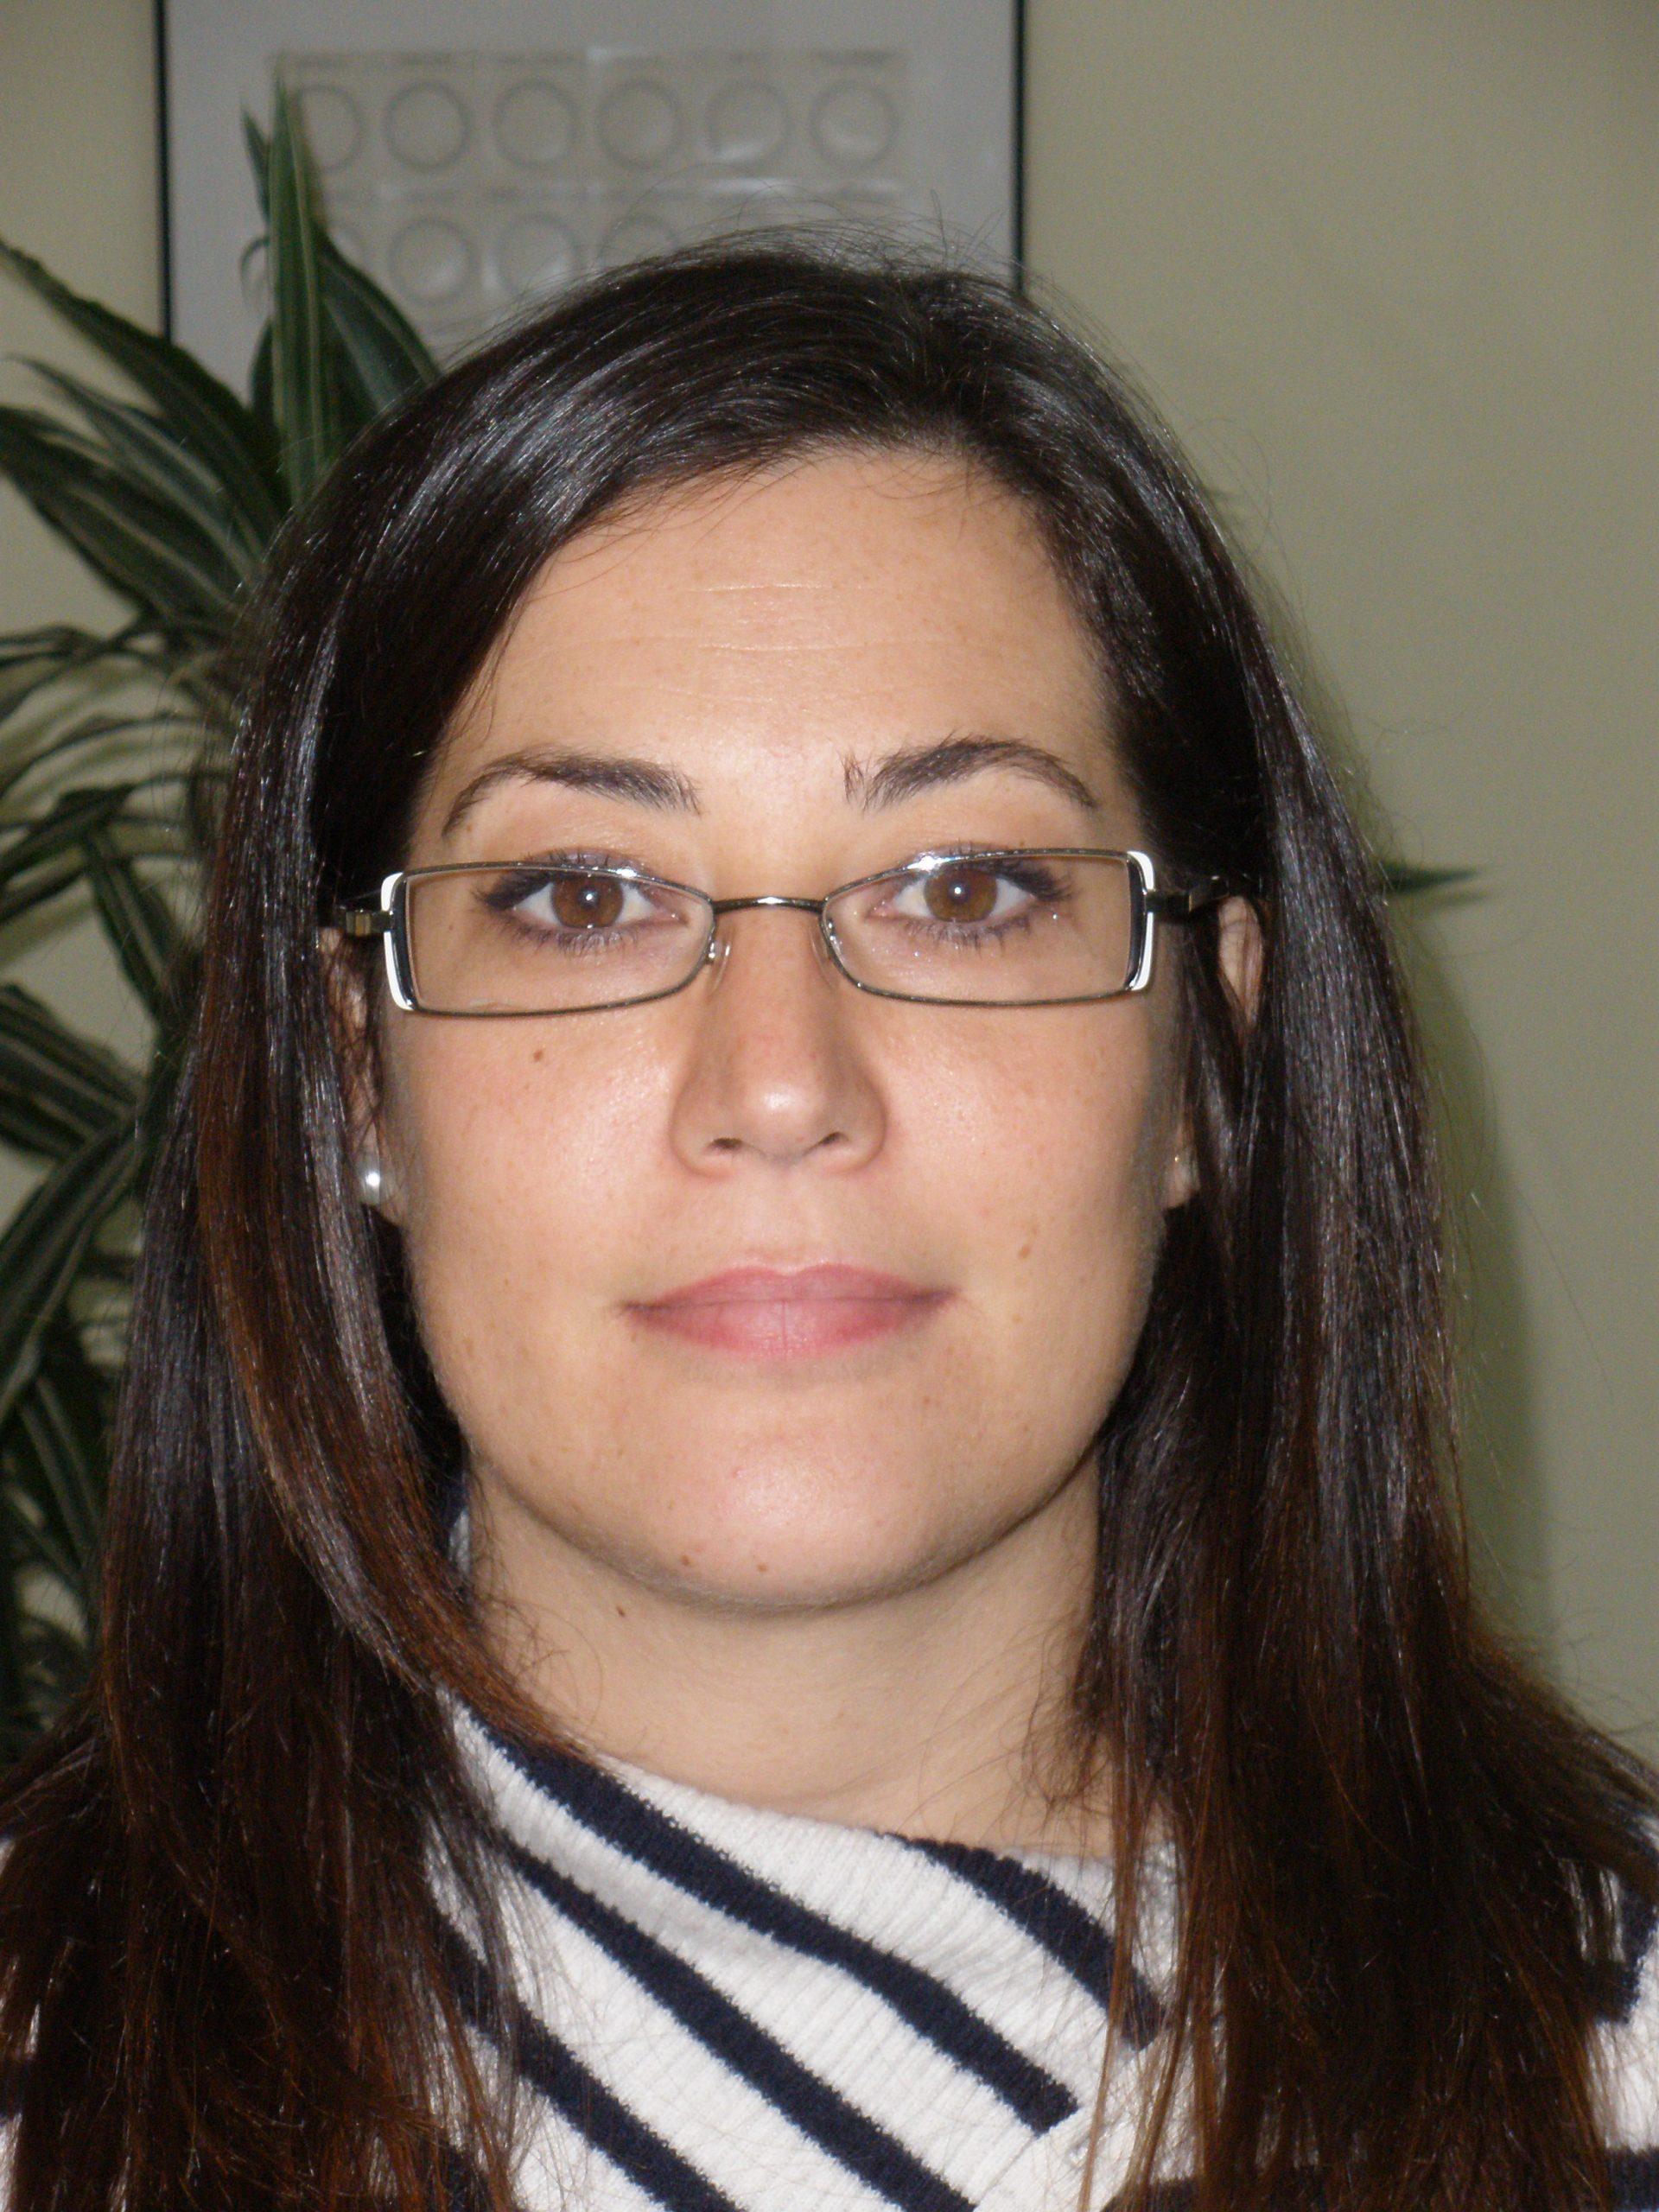 Ana Angulo Prado